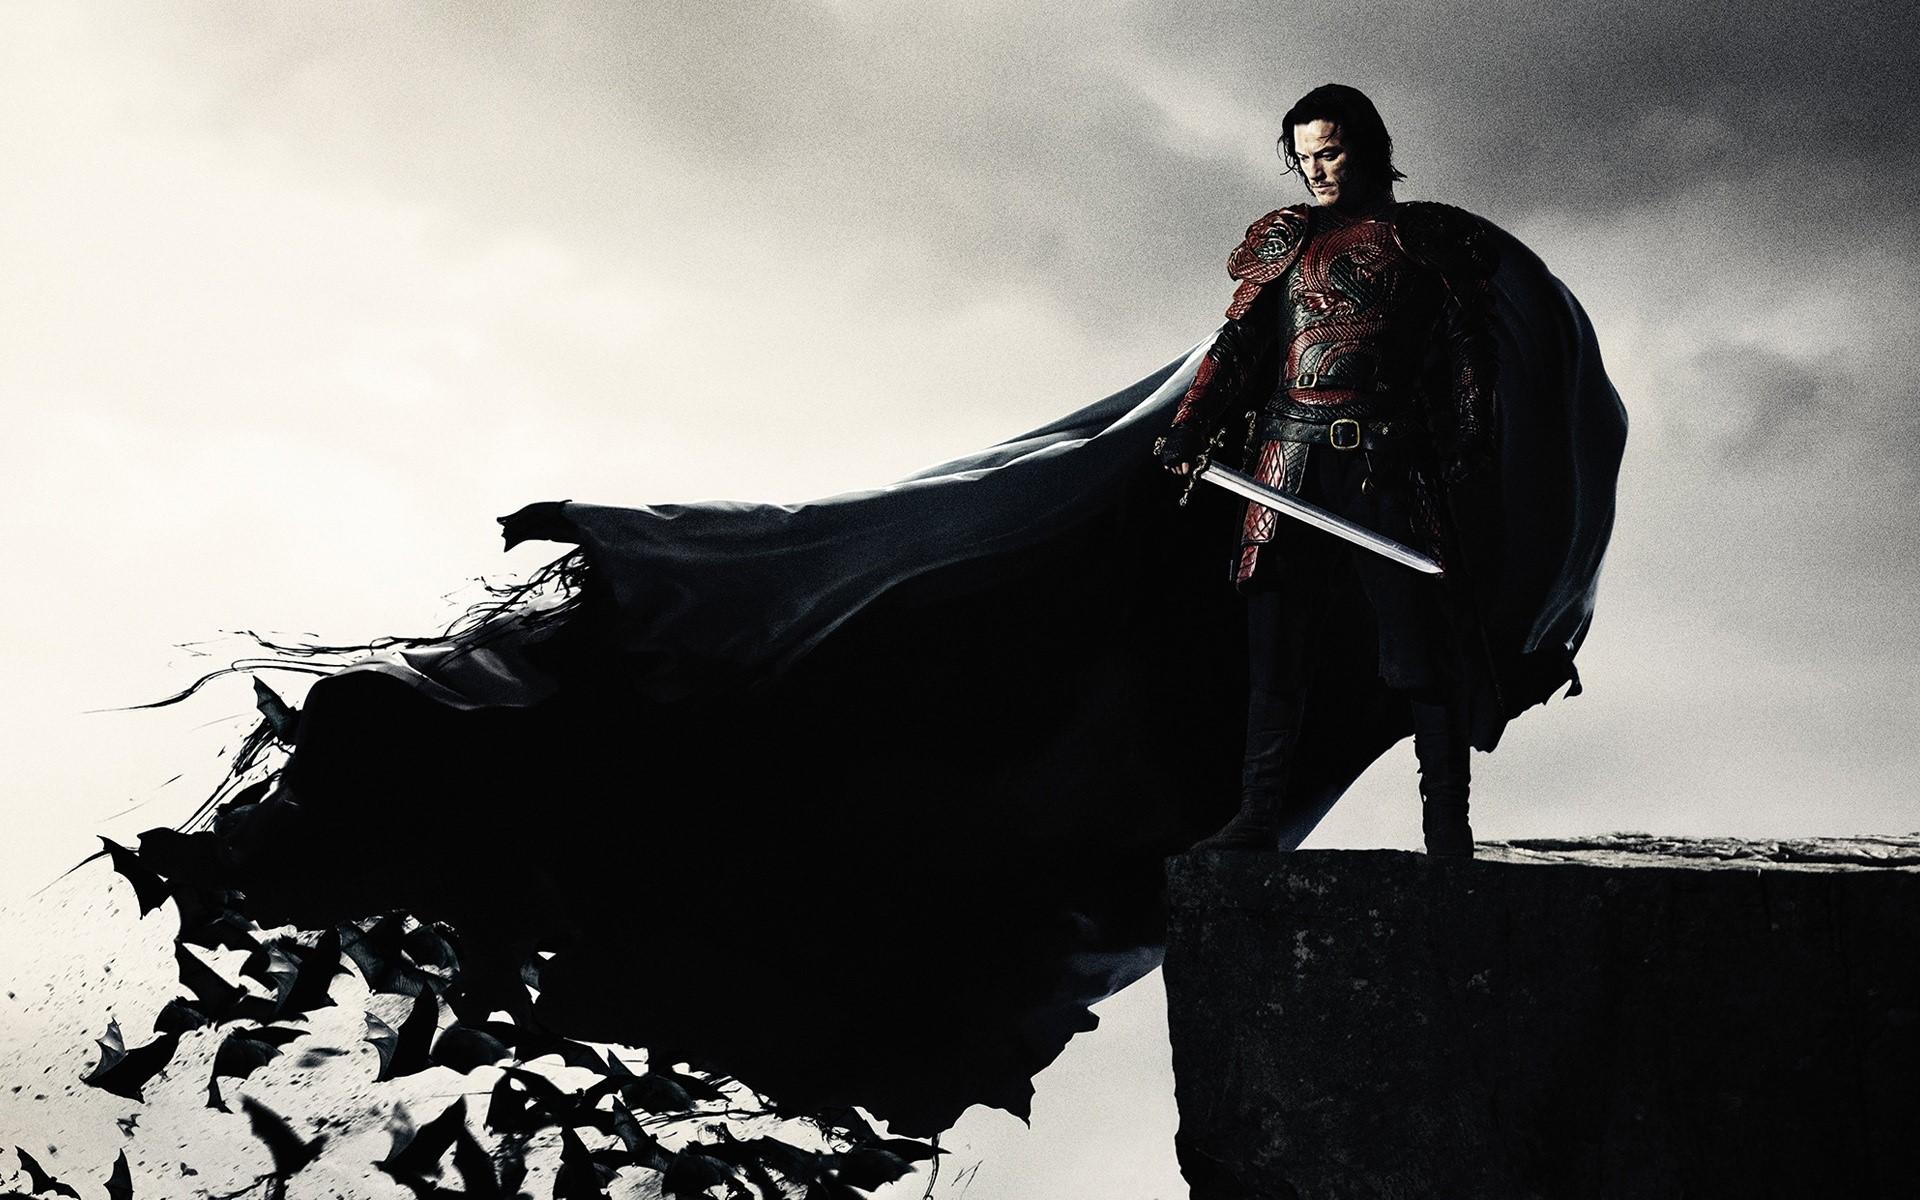 Fondos de pantalla Dracula untold 2014